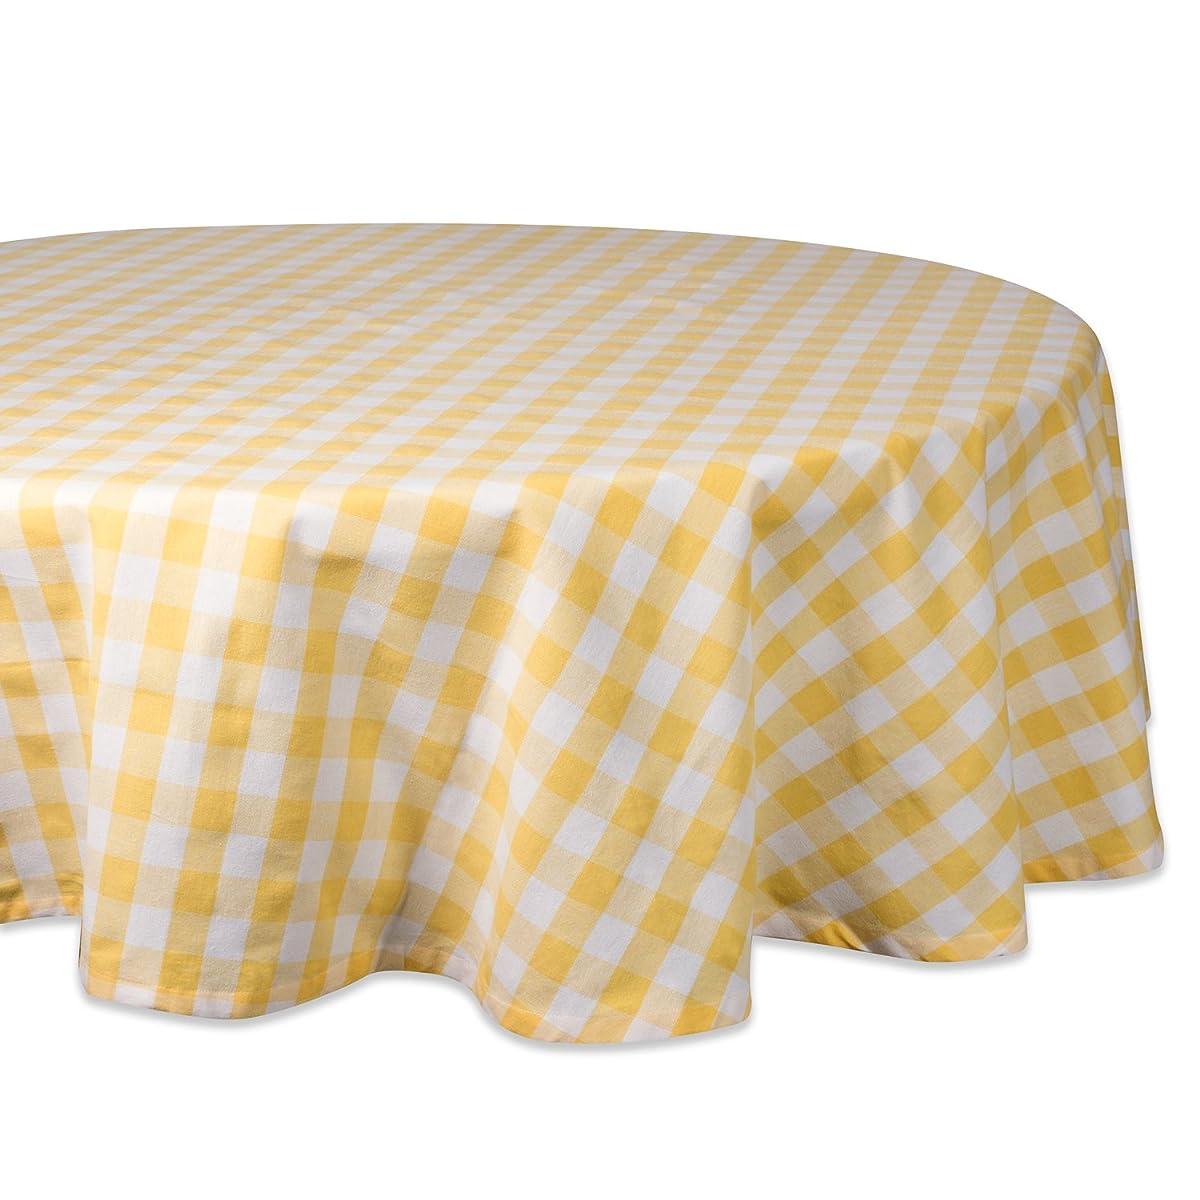 "DII 70"" Round Cotton Tablecloth, Yellow & White Check - Perfect for Spring, Summer, Farmhouse Décor, Picnics & Potlucks or Everyday Use"